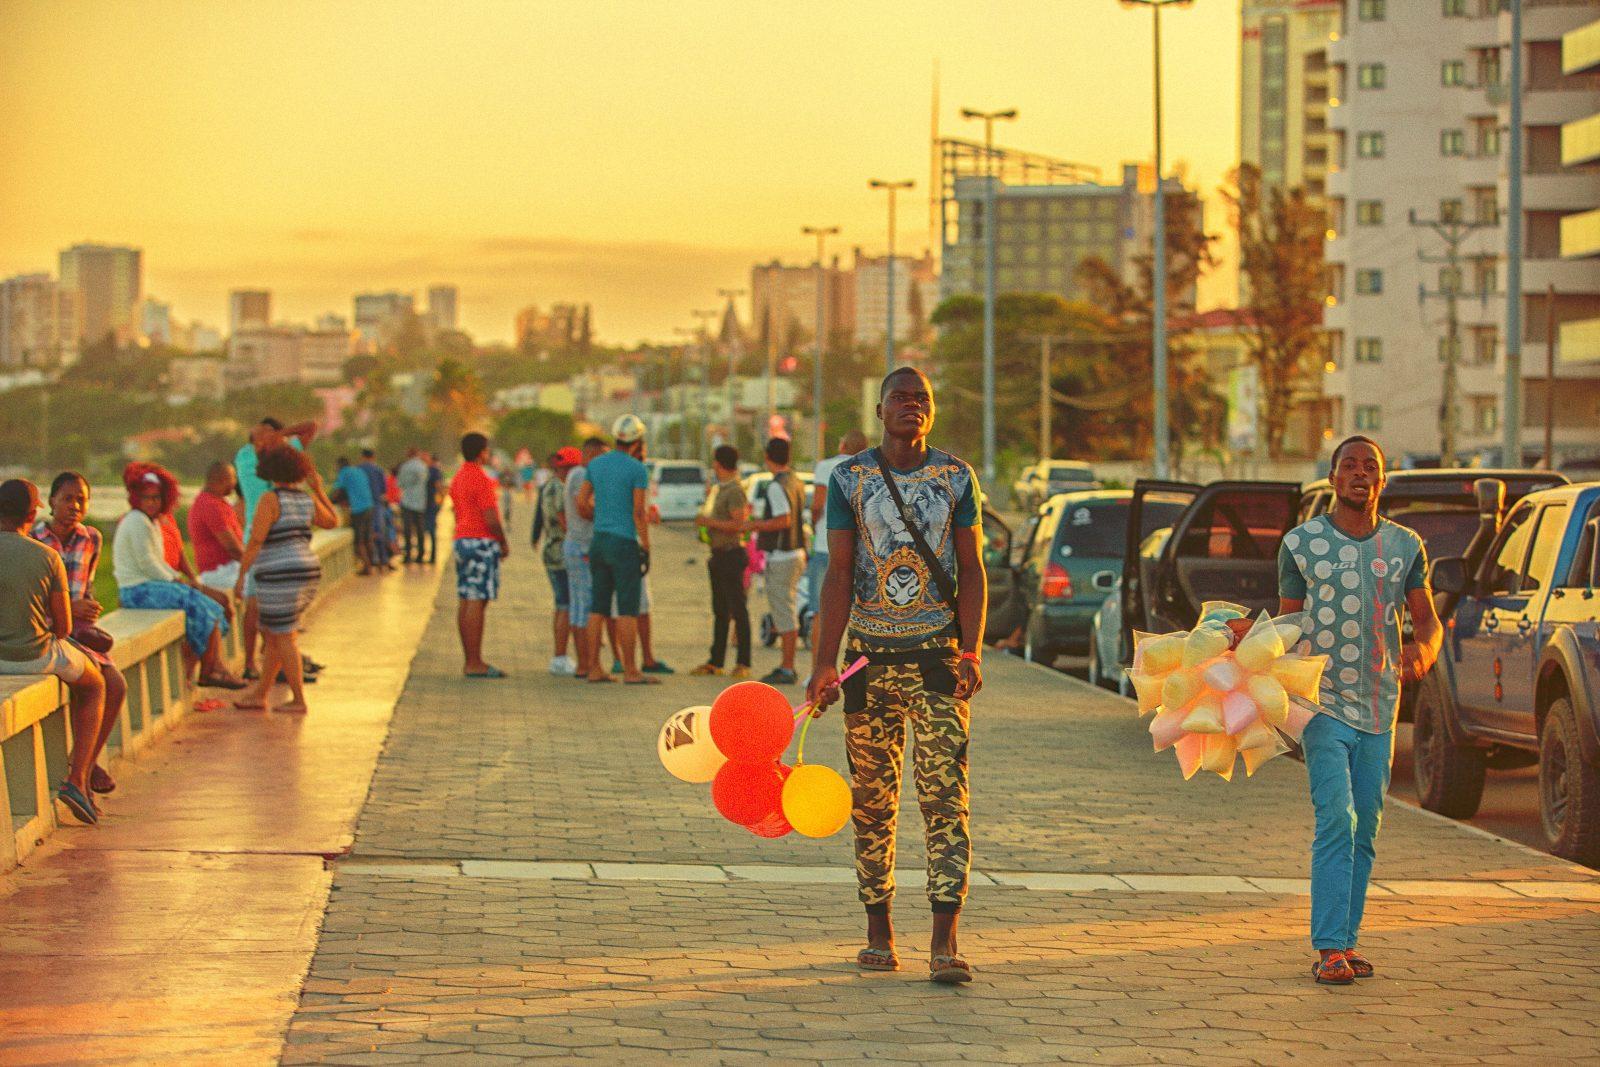 Mozambique street